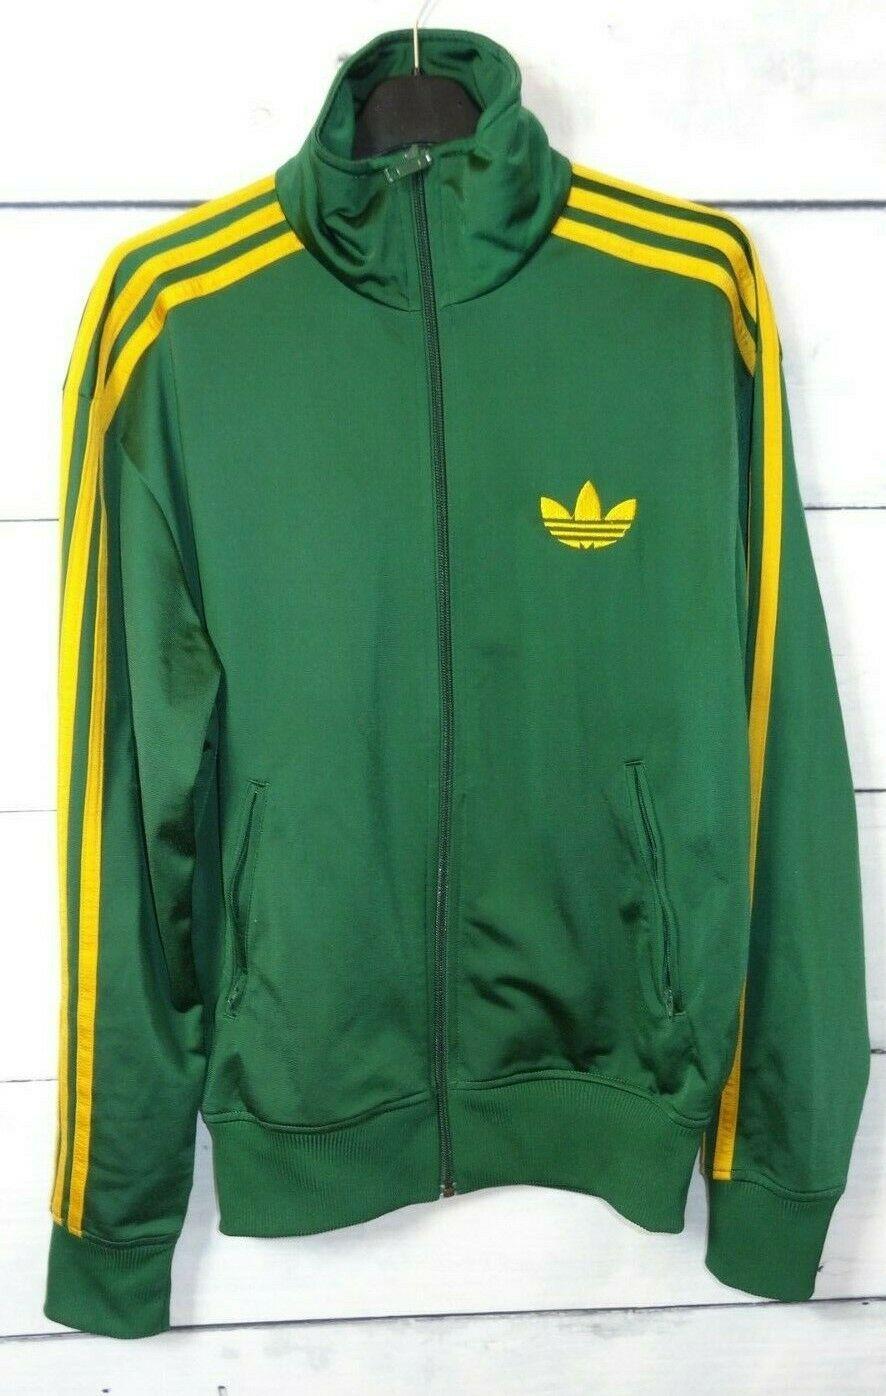 Vintage Green Adidas Track Jacket Size Xs Coats Amp Jackets